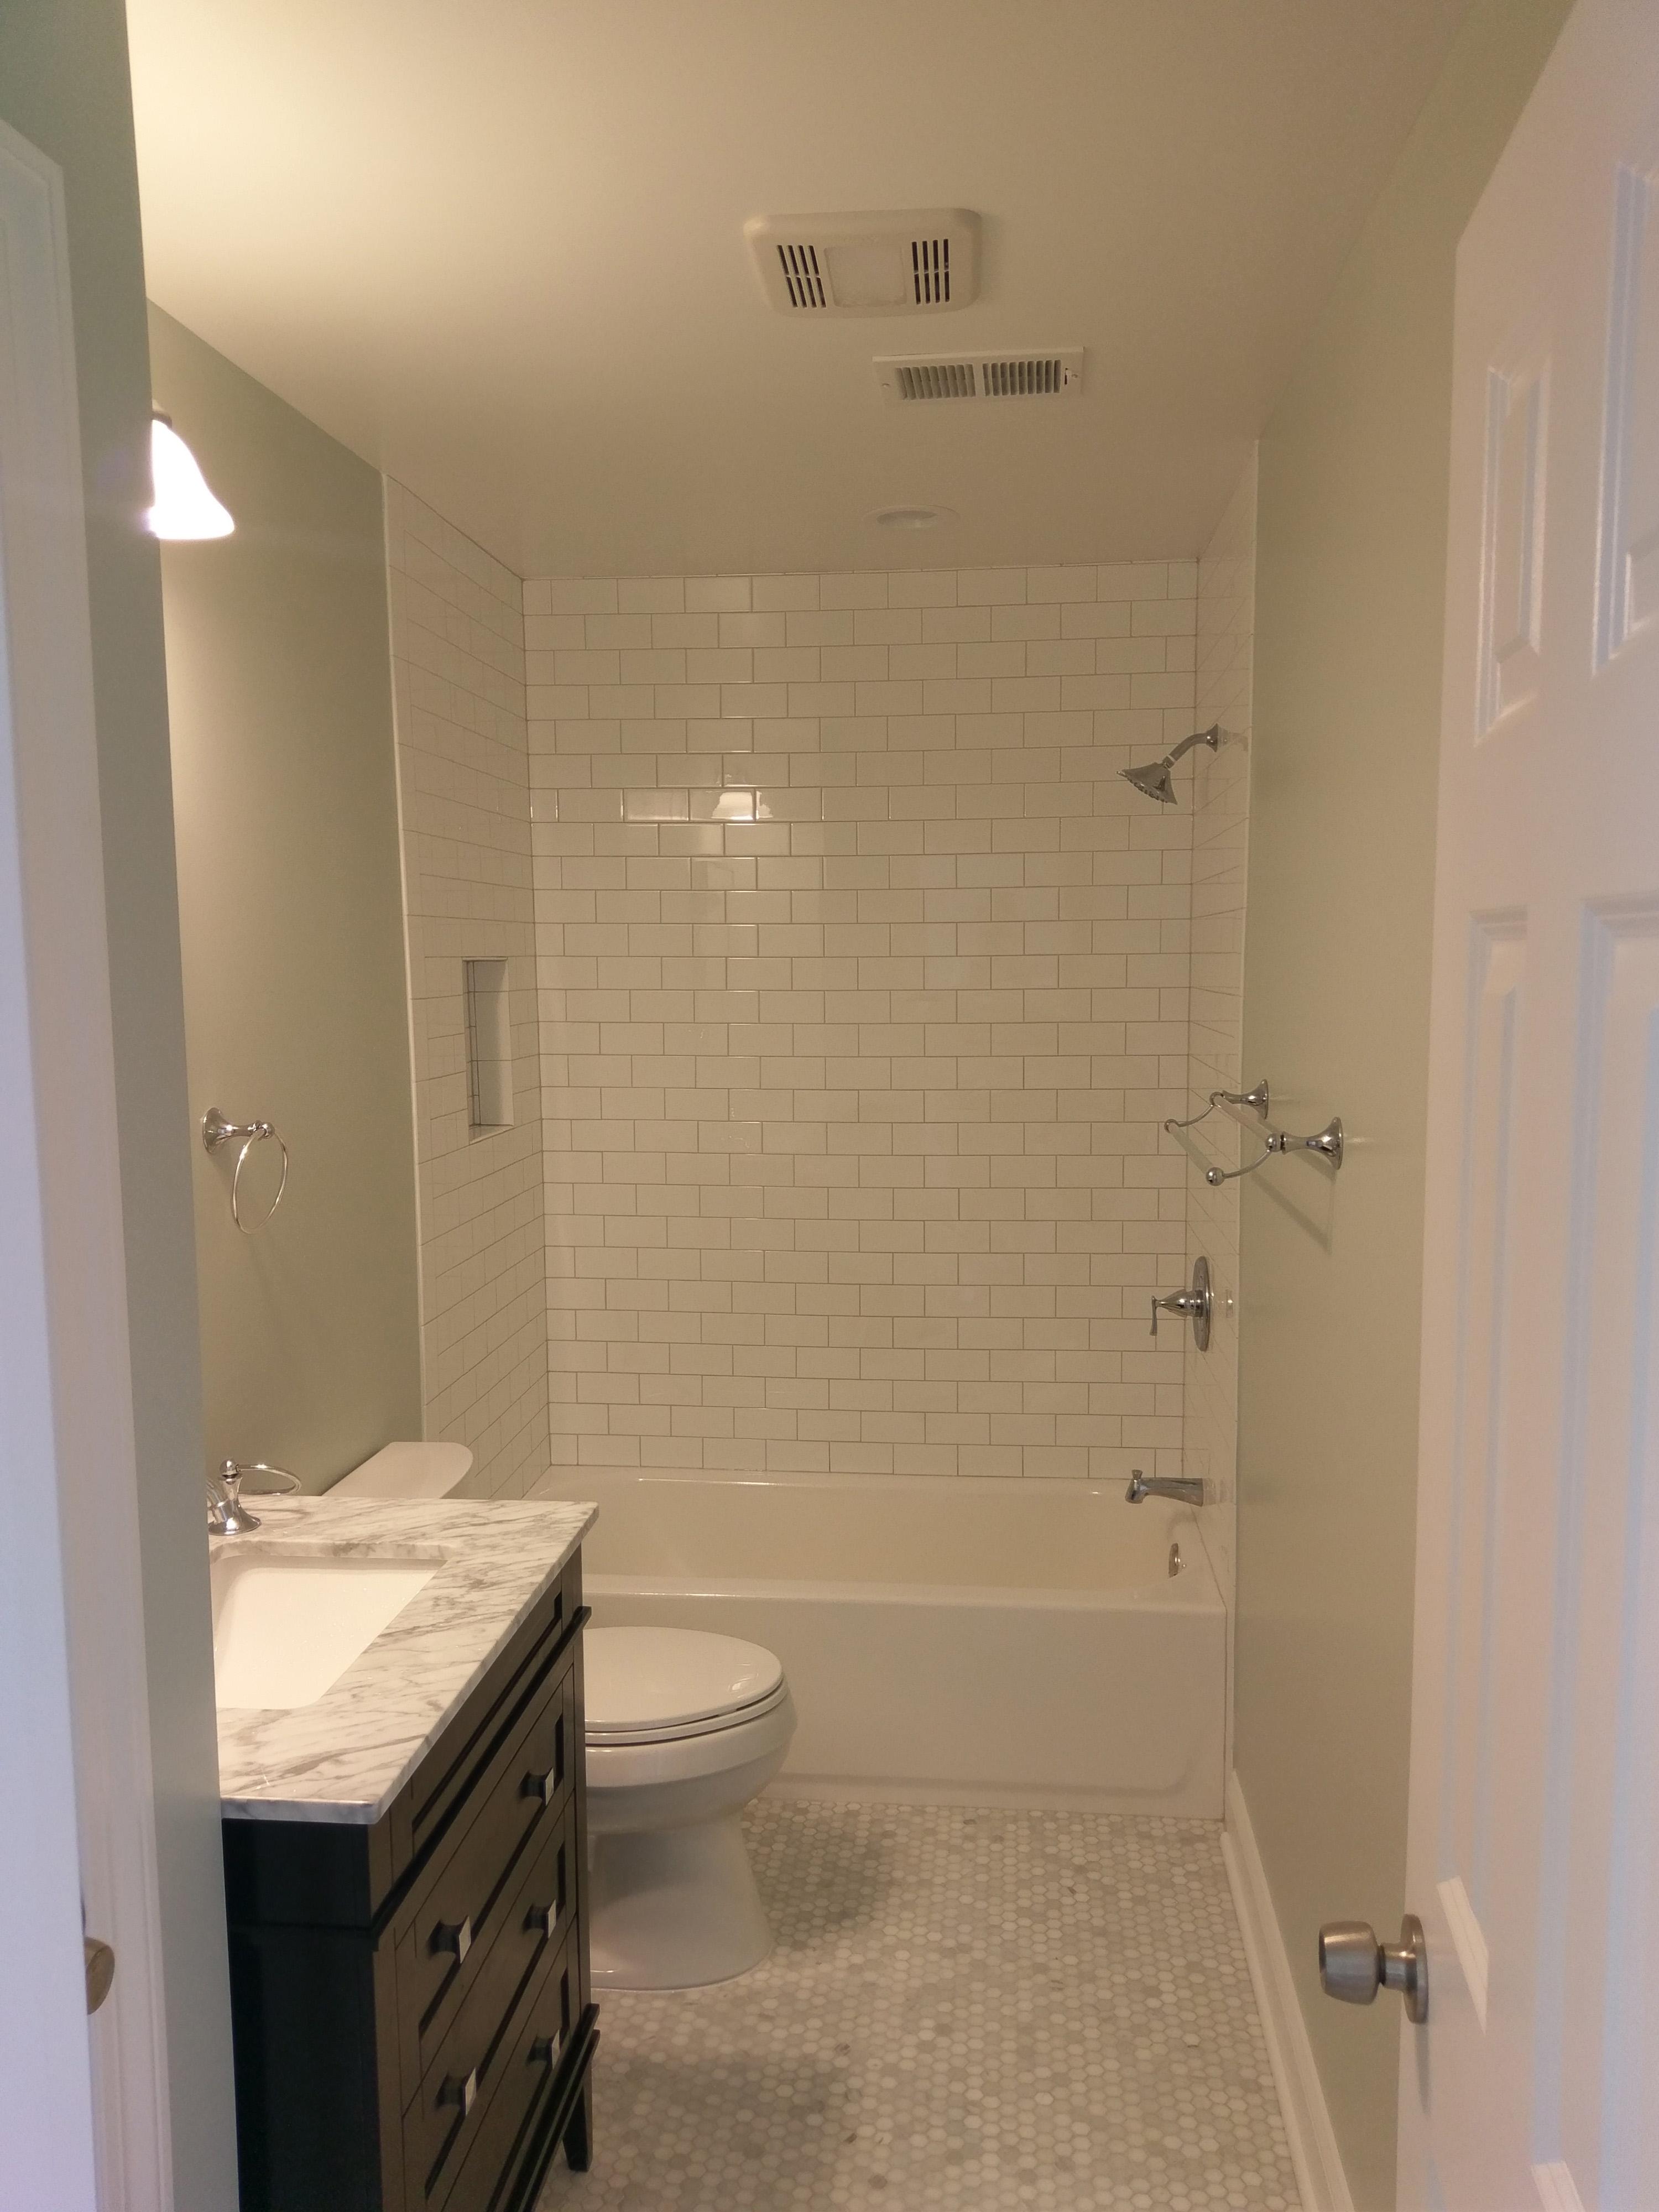 Kitchen remodeling washington dc contractor bathroom remodel contractor